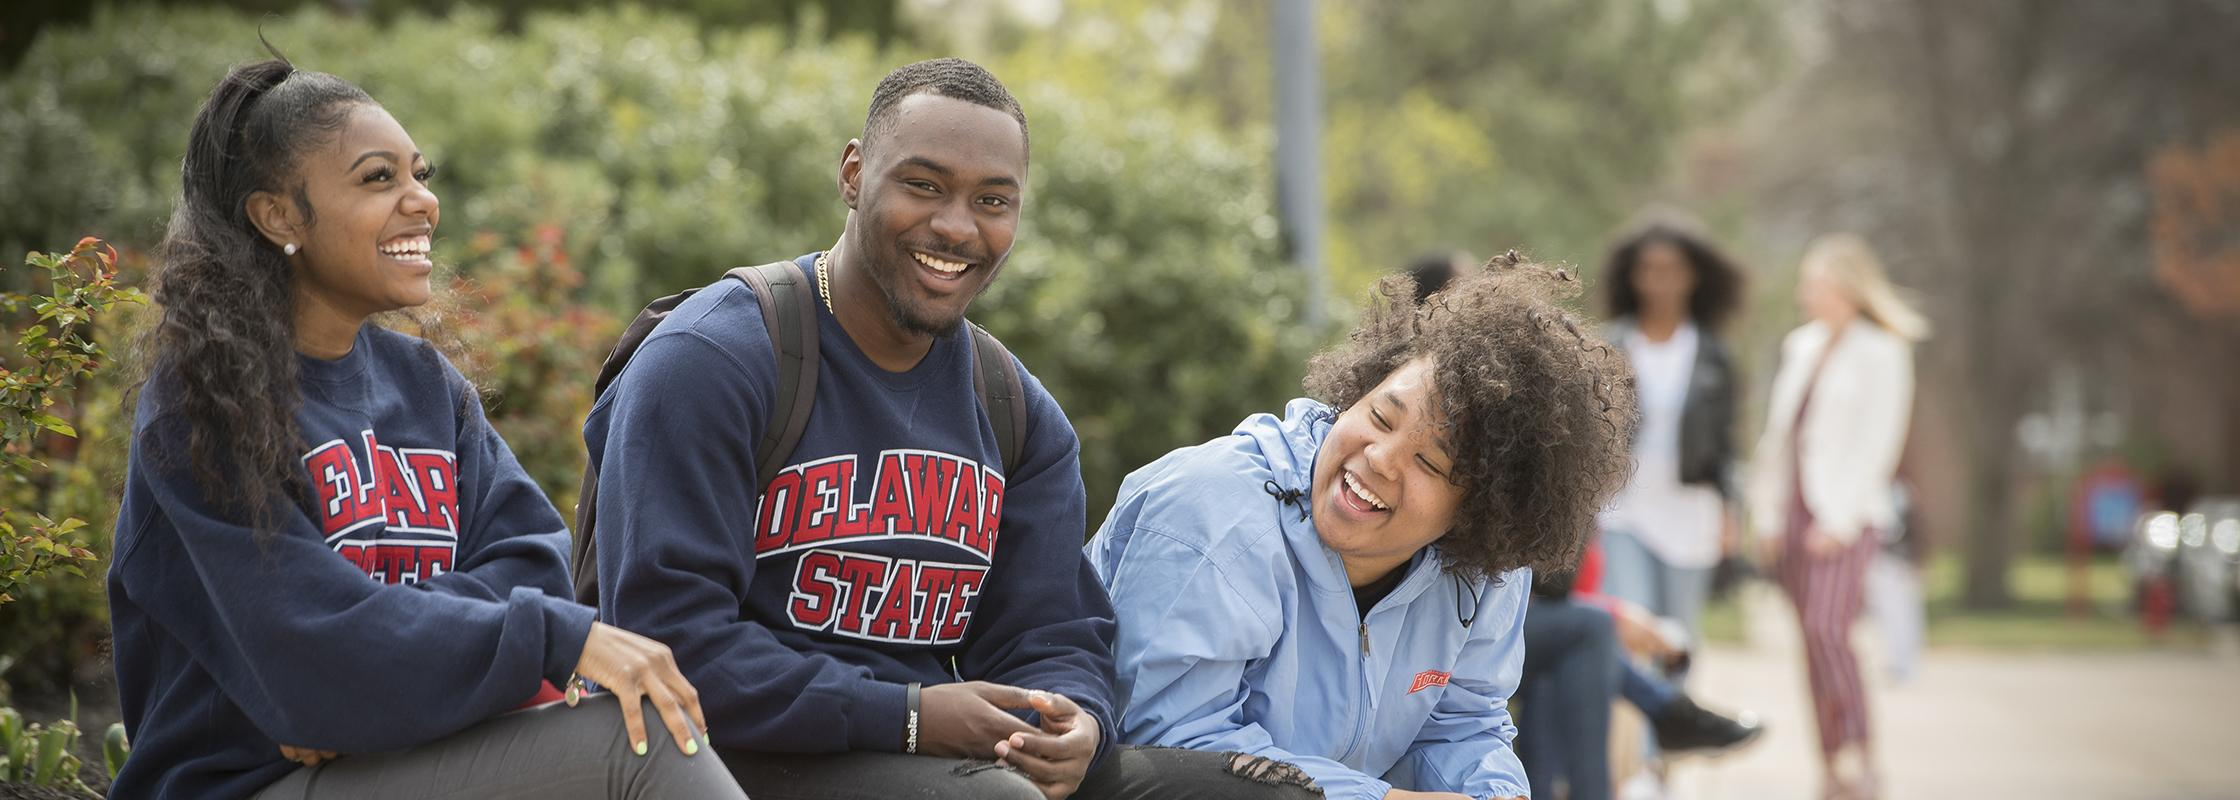 Next Steps at Delaware State University